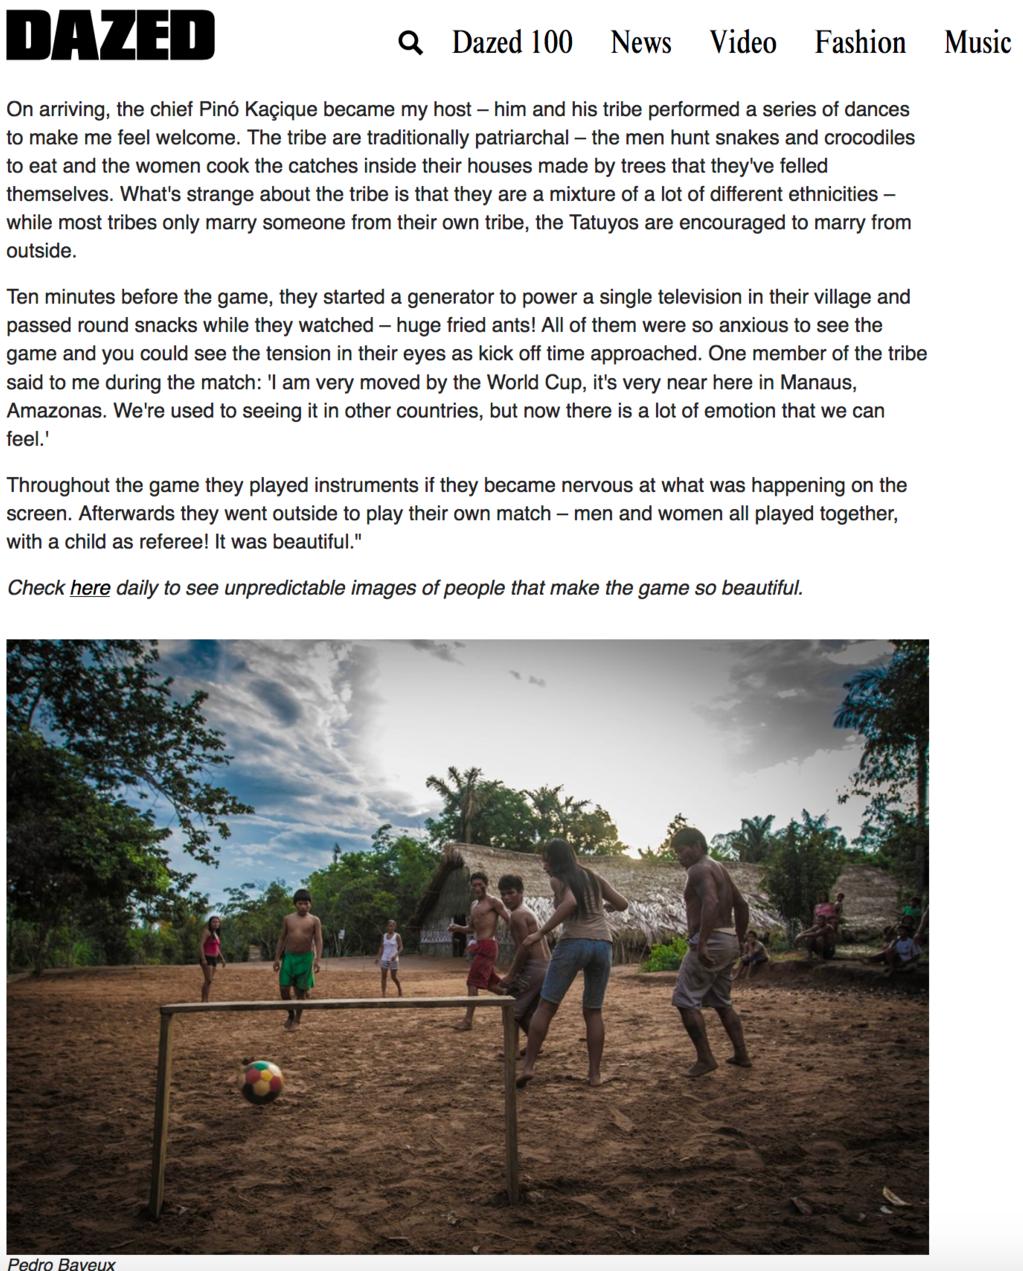 http://www.dazeddigital.com/artsandculture/article/20374/1/tribal-football-in-the-amazon